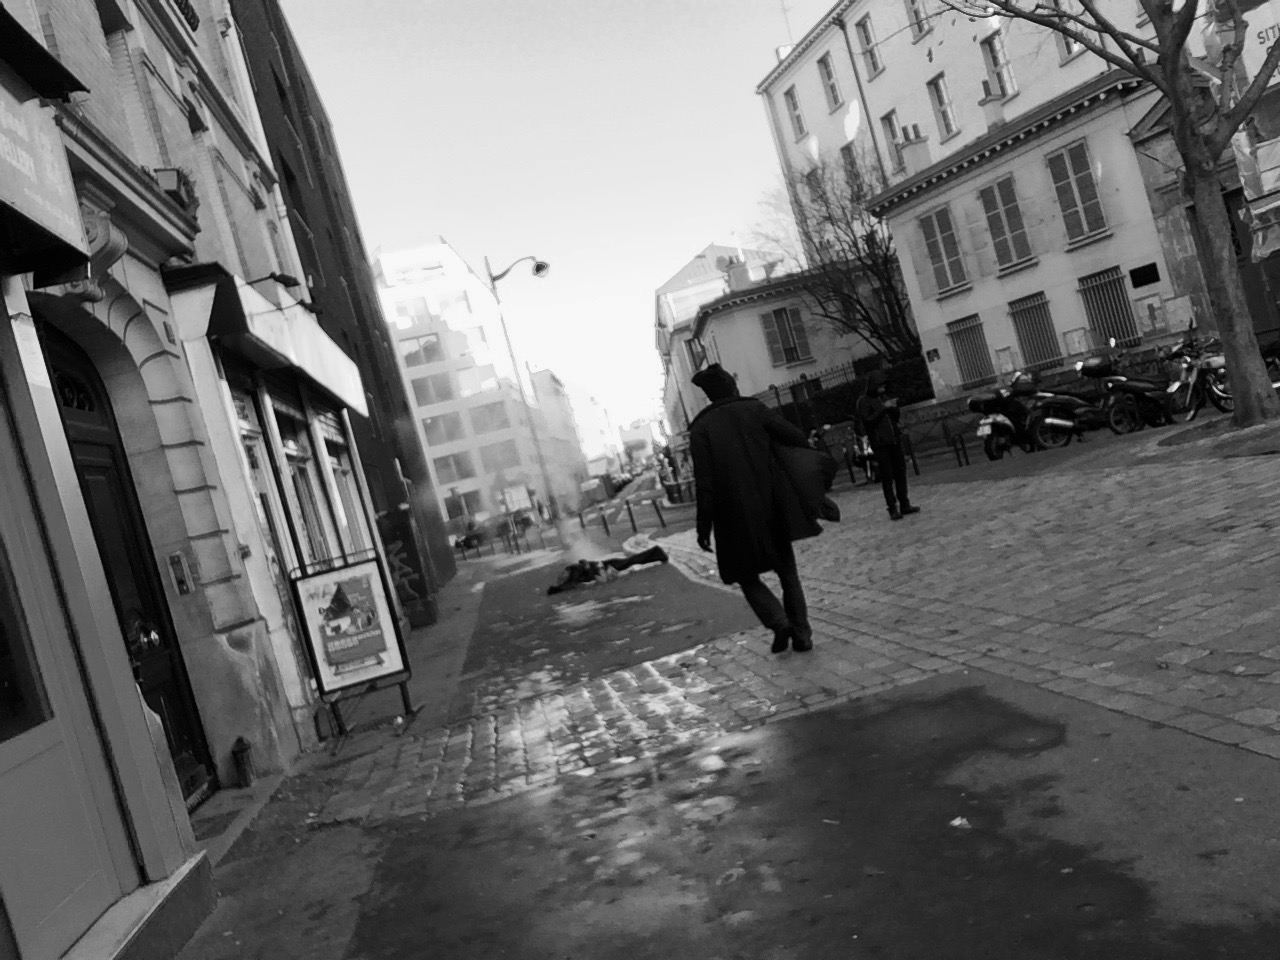 man_walking_lying_on_street_december_2017.jpg